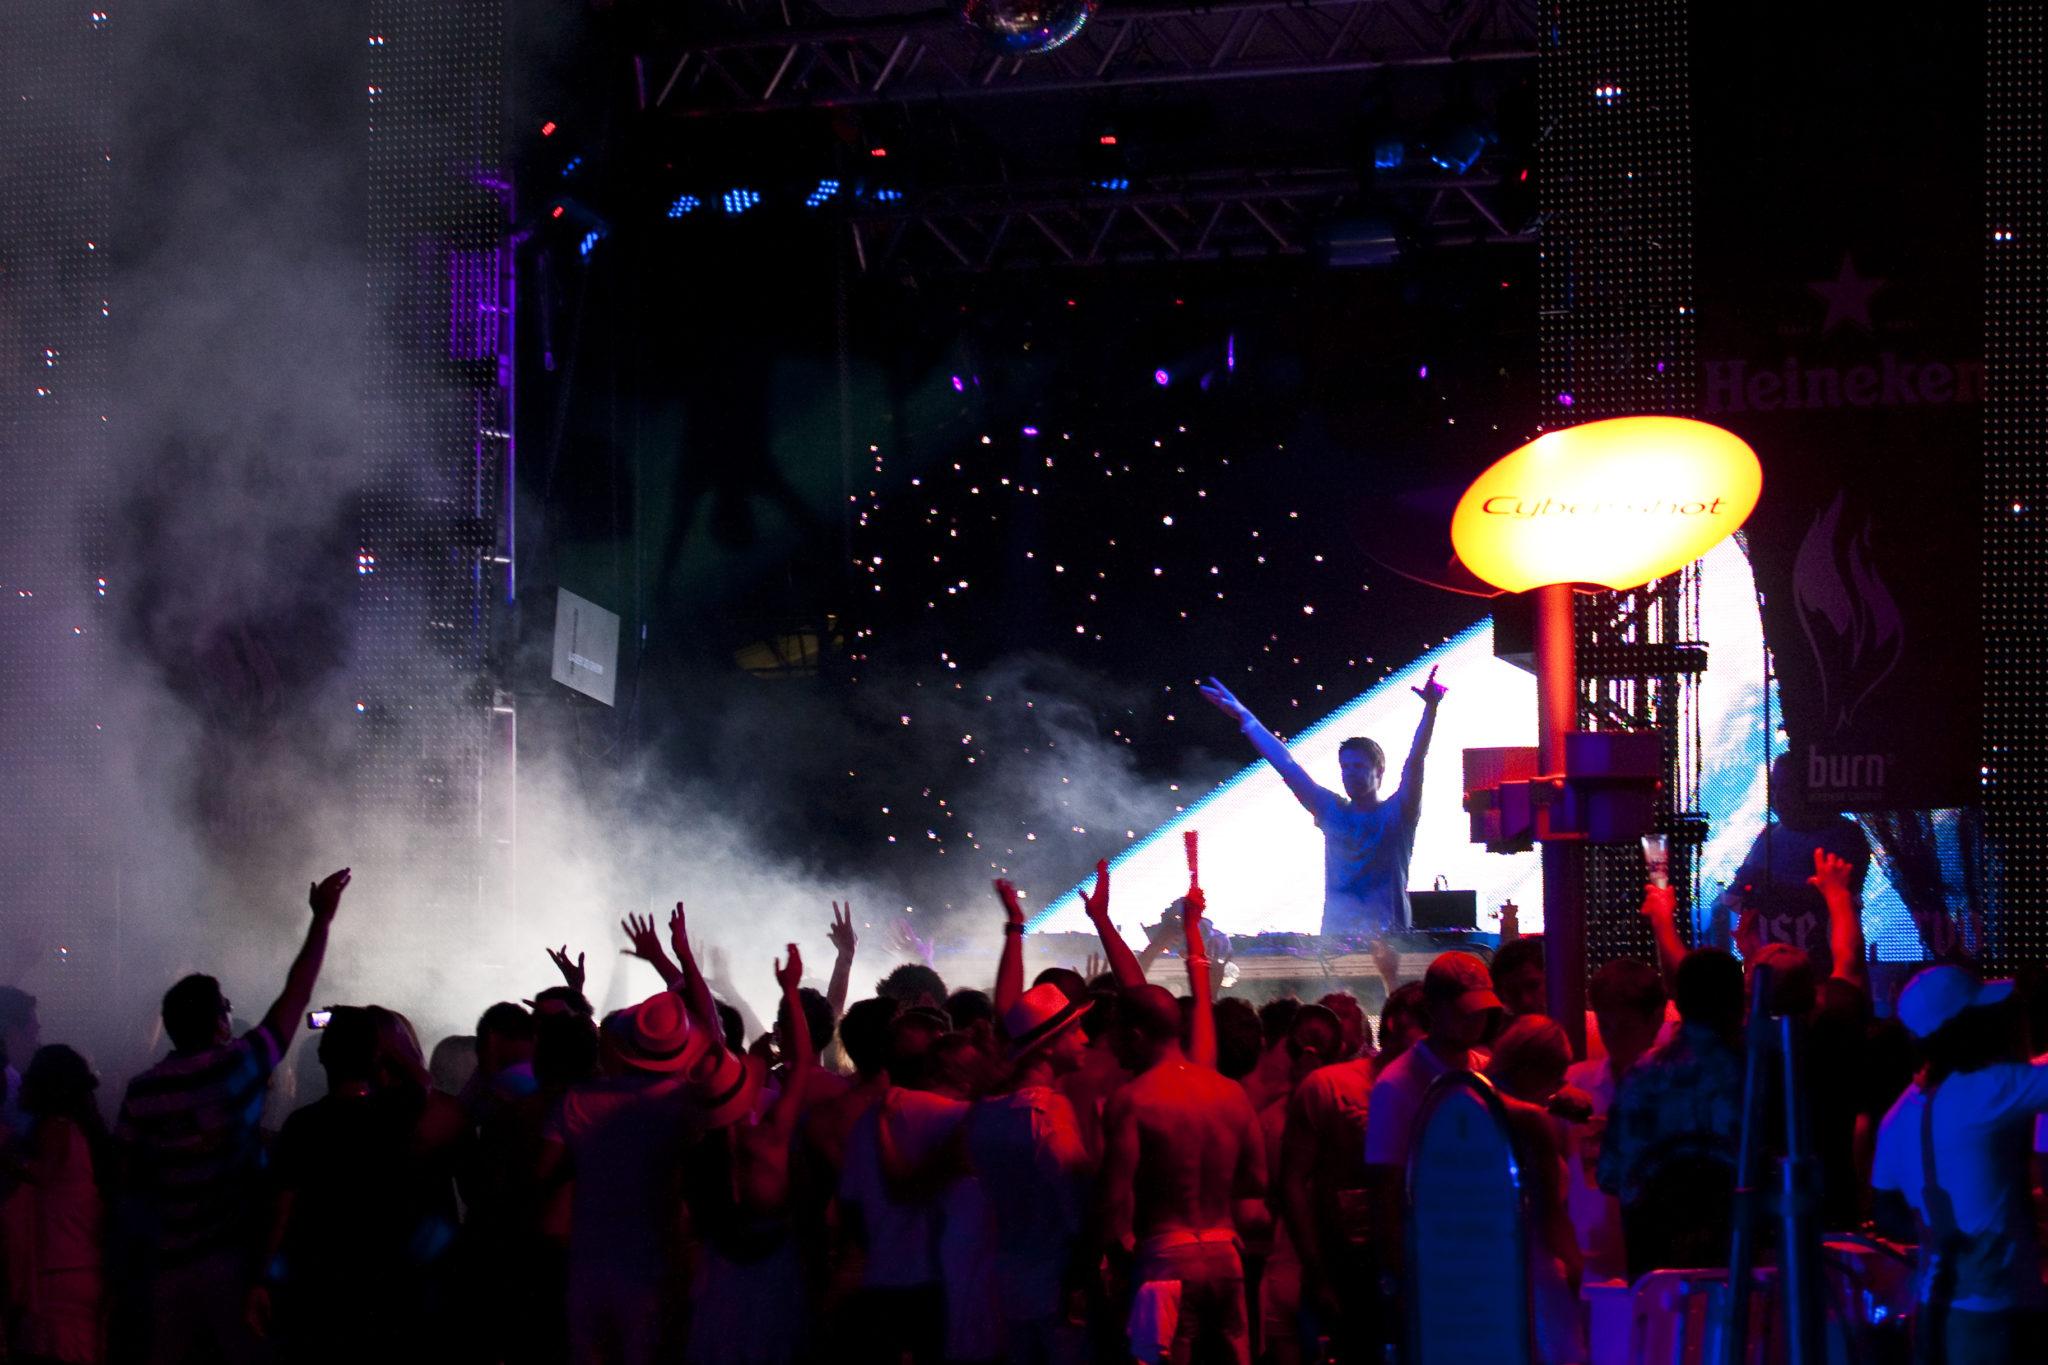 Vem aí o MOB Festival 2014! Conheça as atrações. Kolombo, Lee Foss, Miguel Migs, Miss Nine, MOB Festival, Sandy Rivera, Sharam